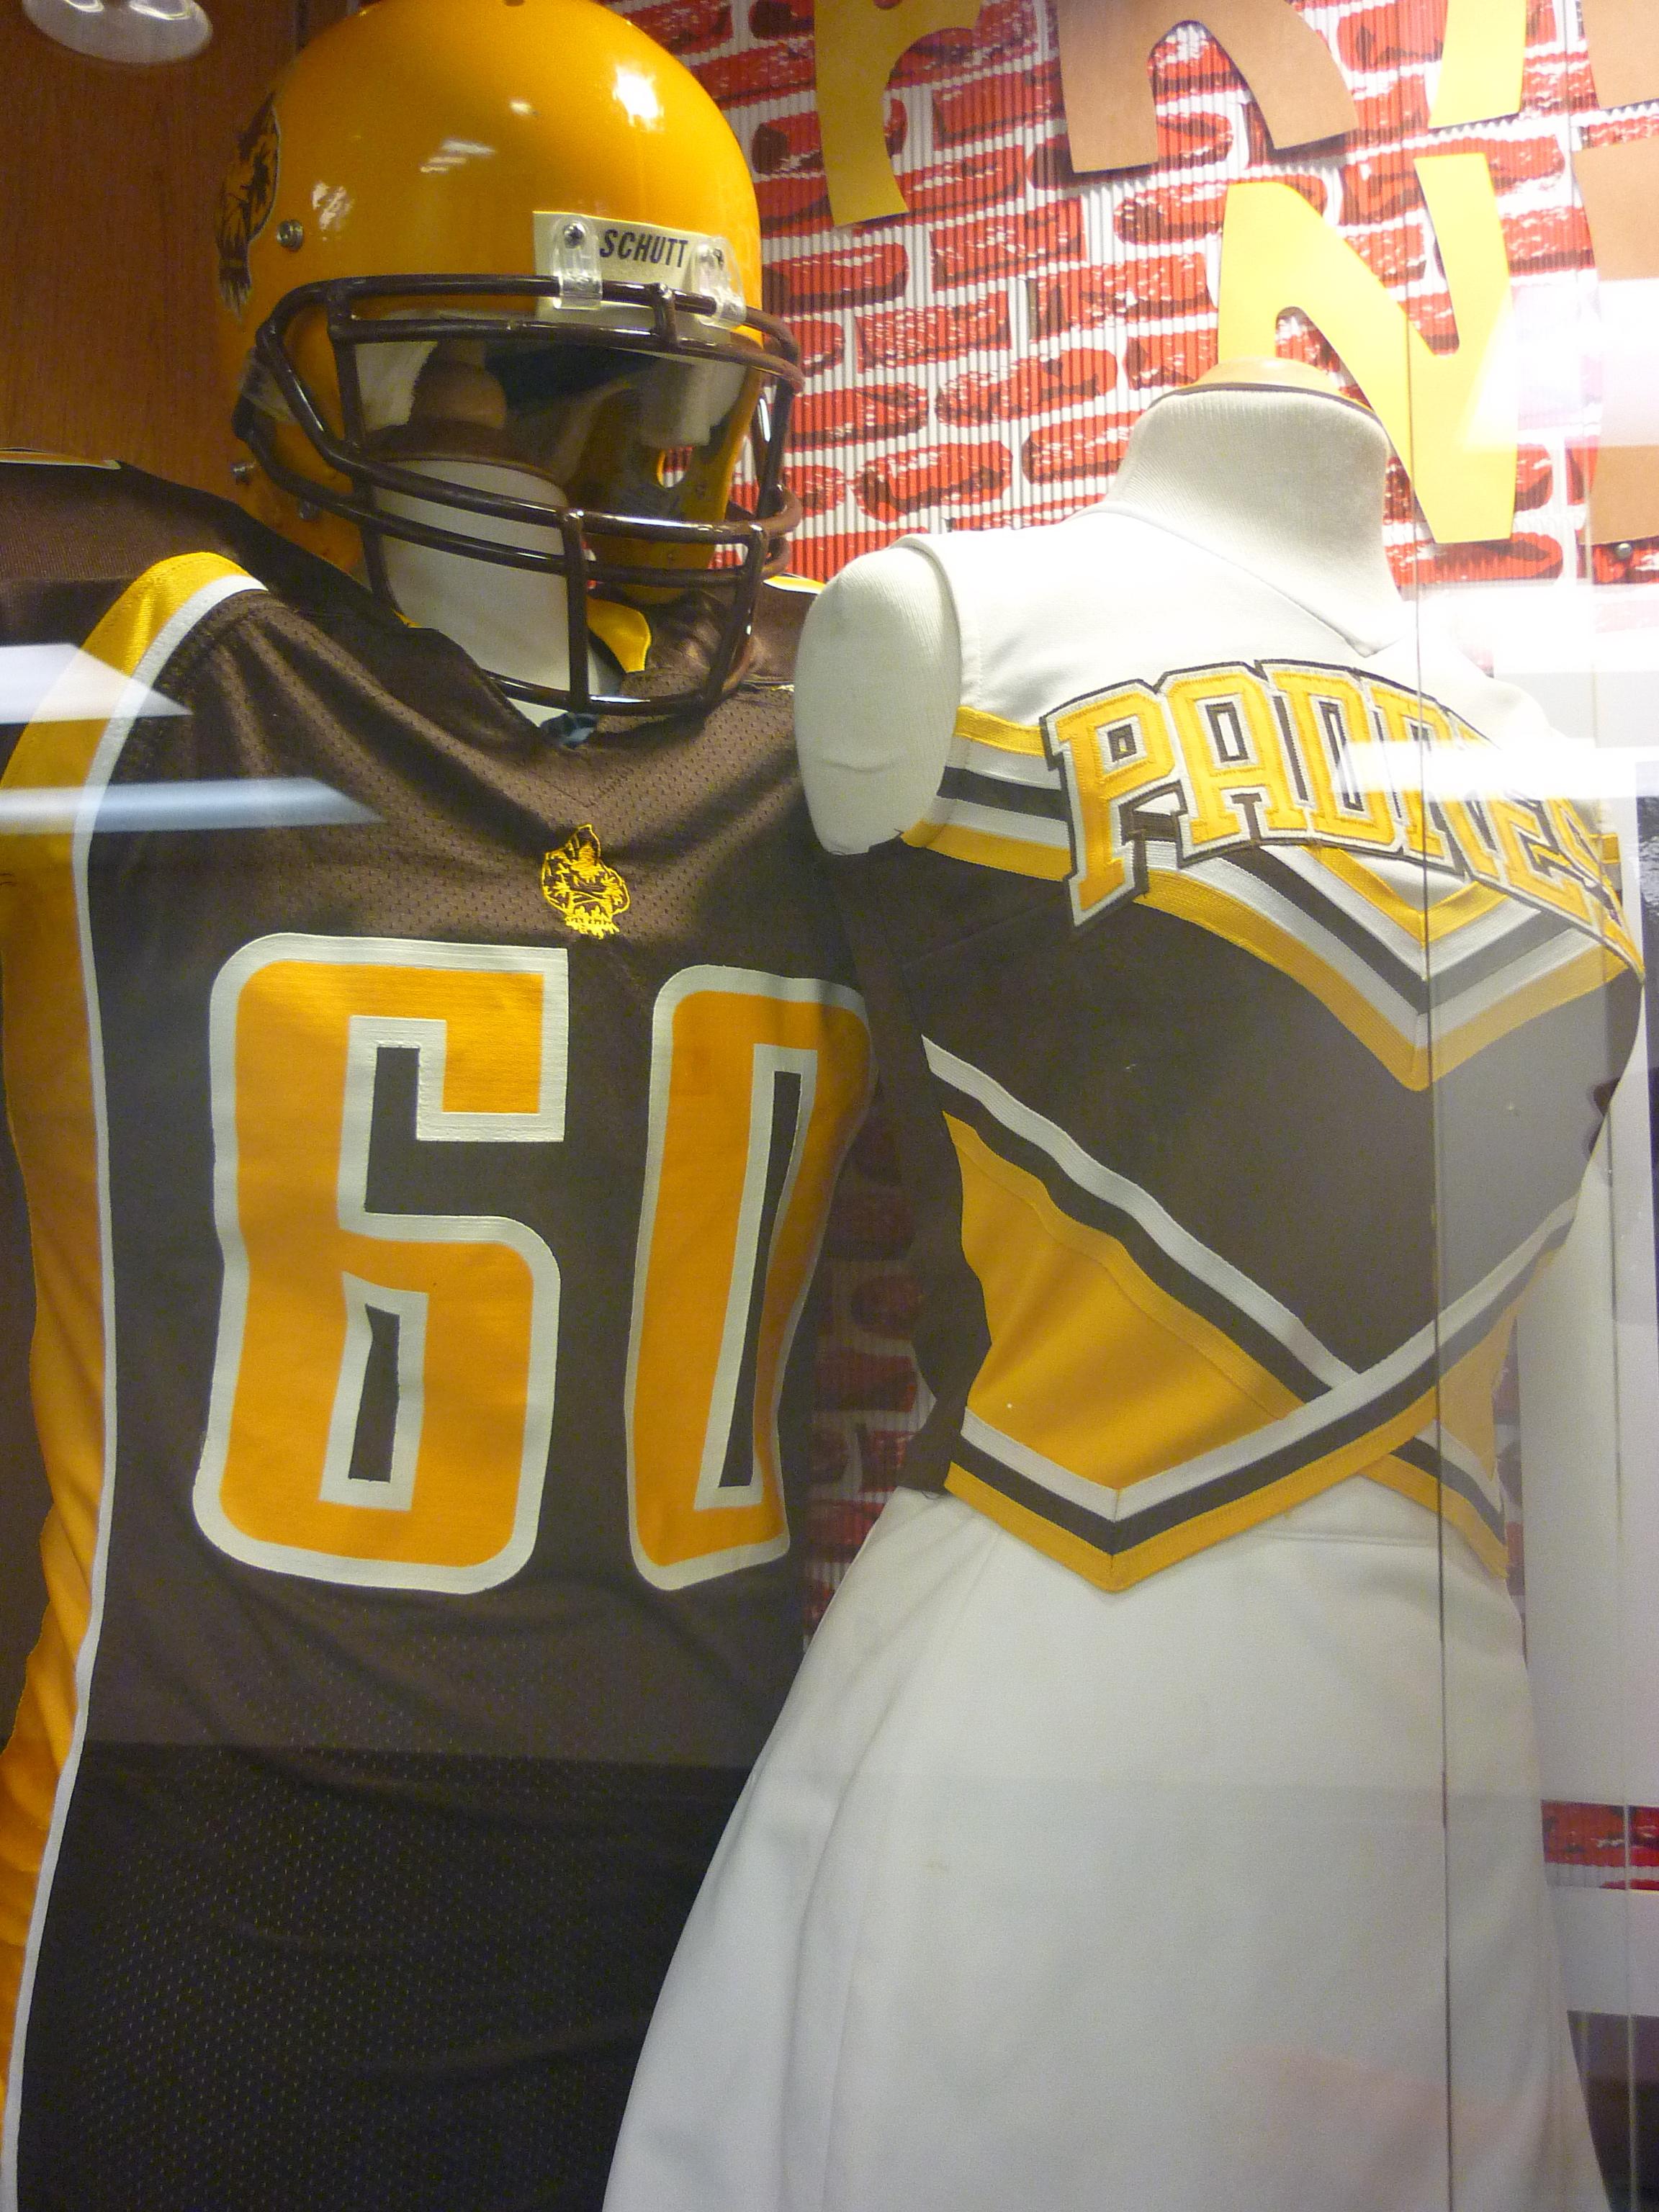 Marcos de Niza High School display showcasing Padre uniforms